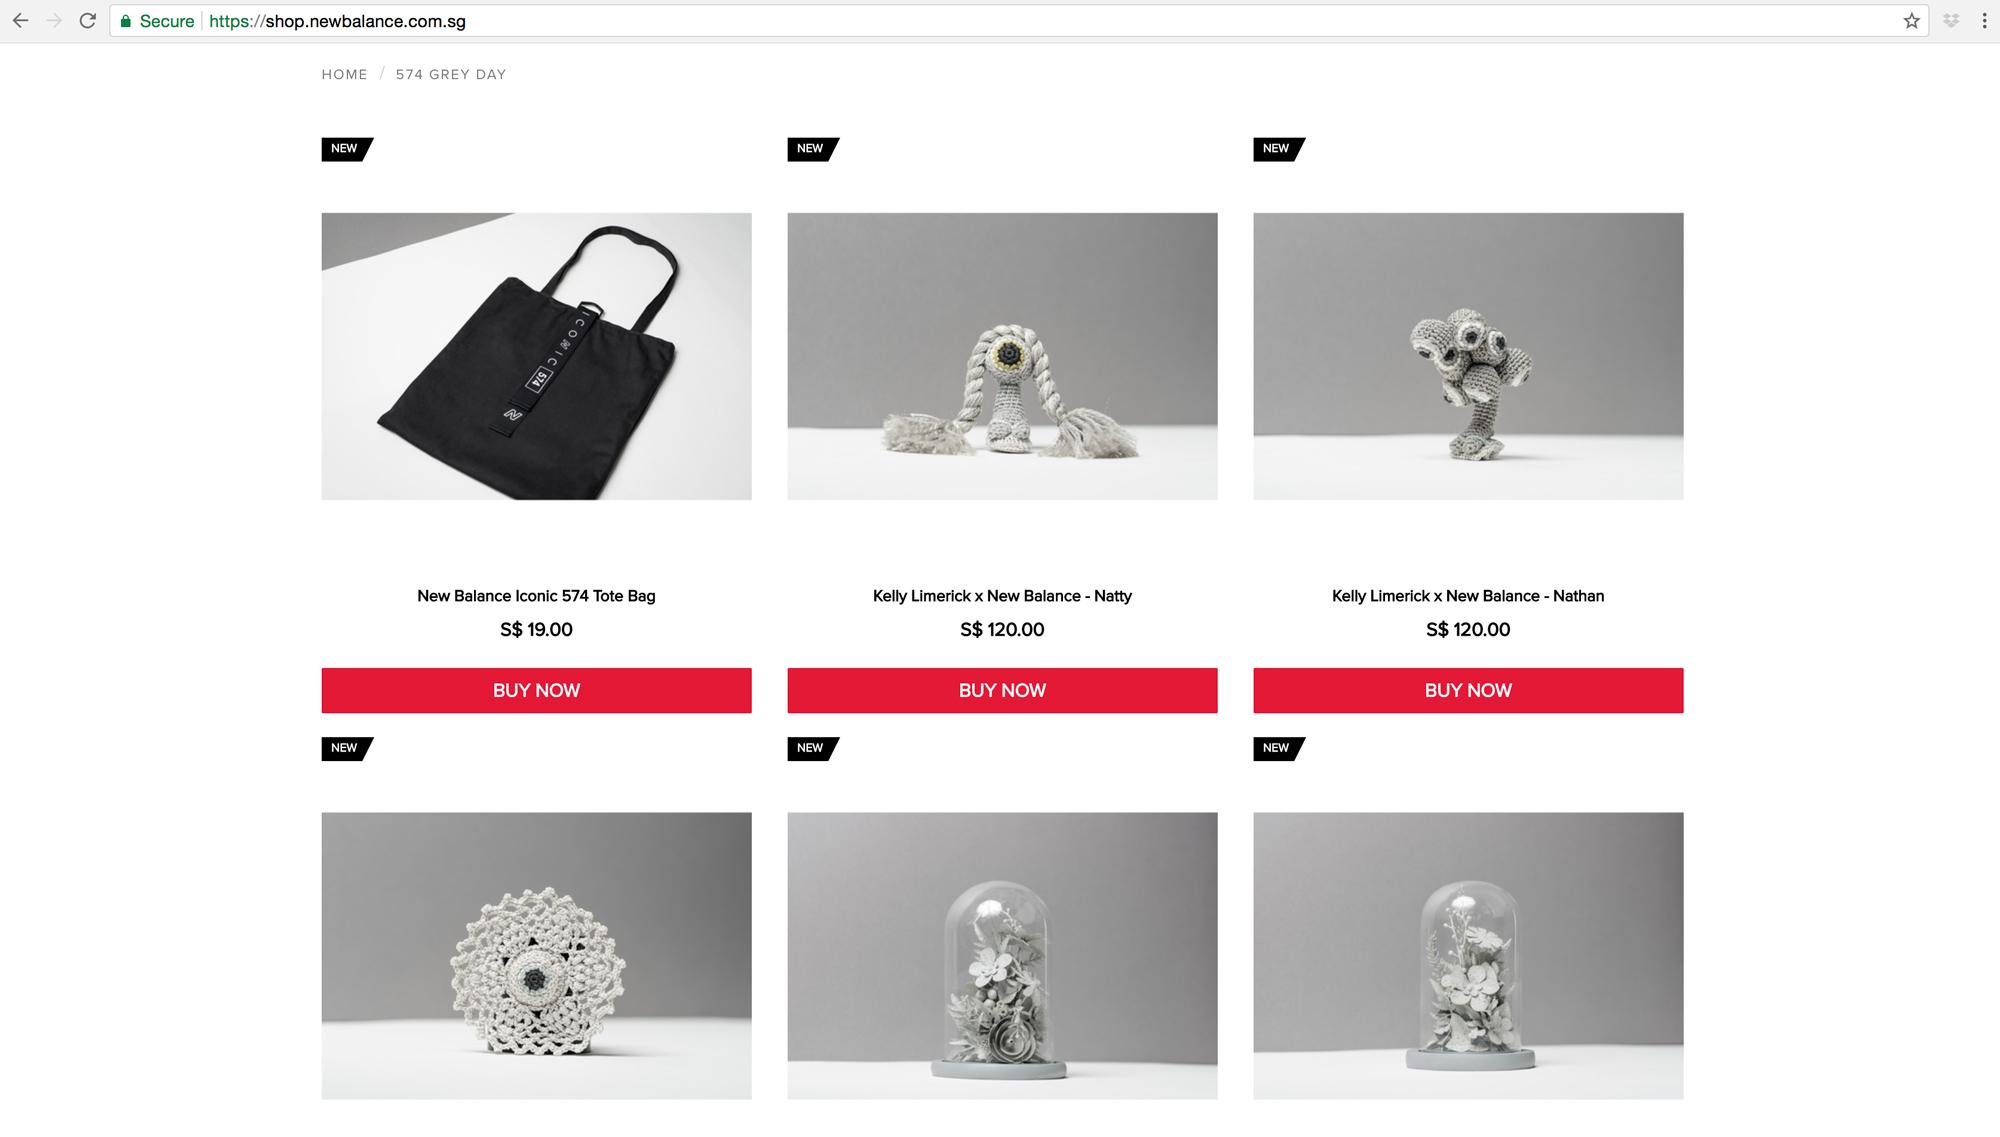 NewBalanceSG-Greyday-Merchandise.jpg